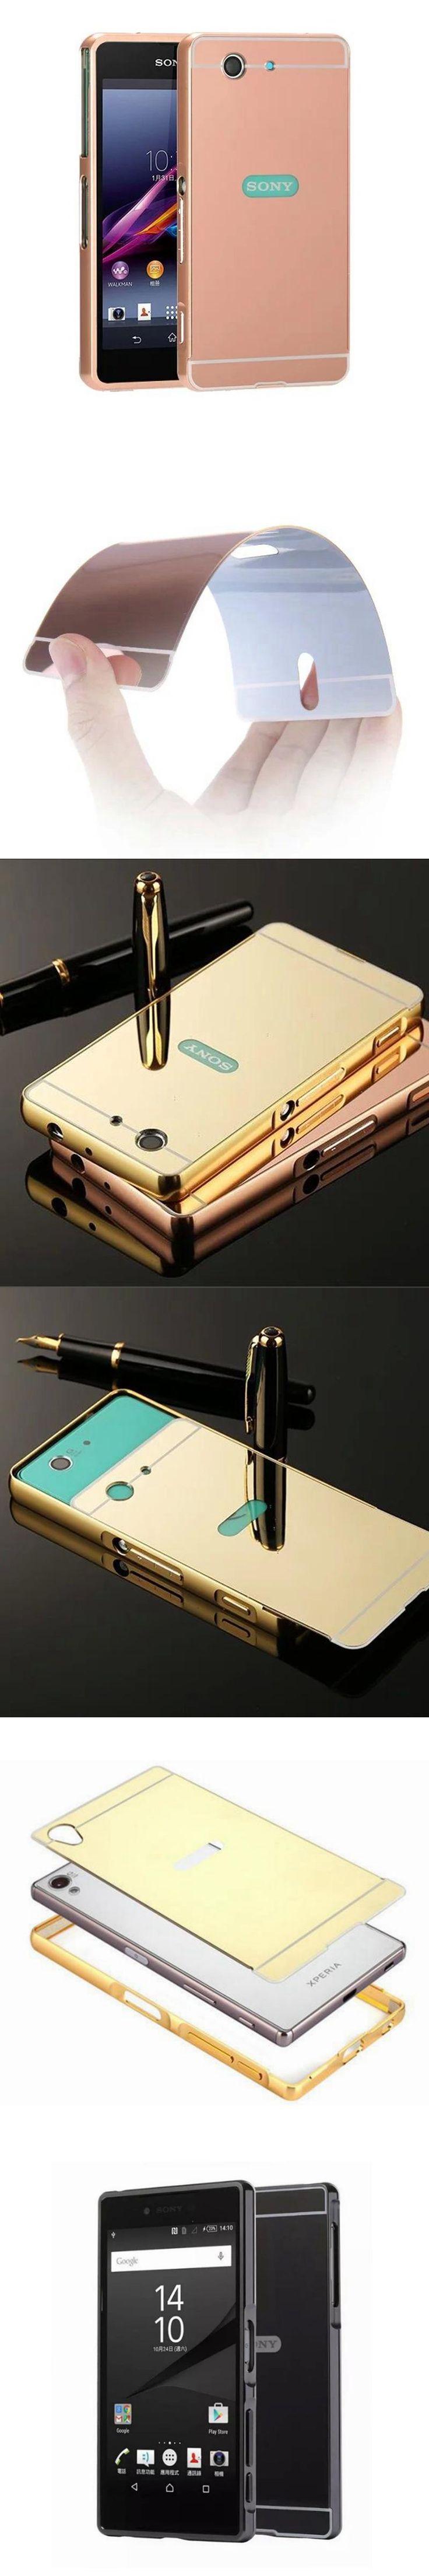 Z3 pact Cases Gold Shinny Mirror Back Cover For Fundas Sony Xperia Z5 Premium Z4 Z3